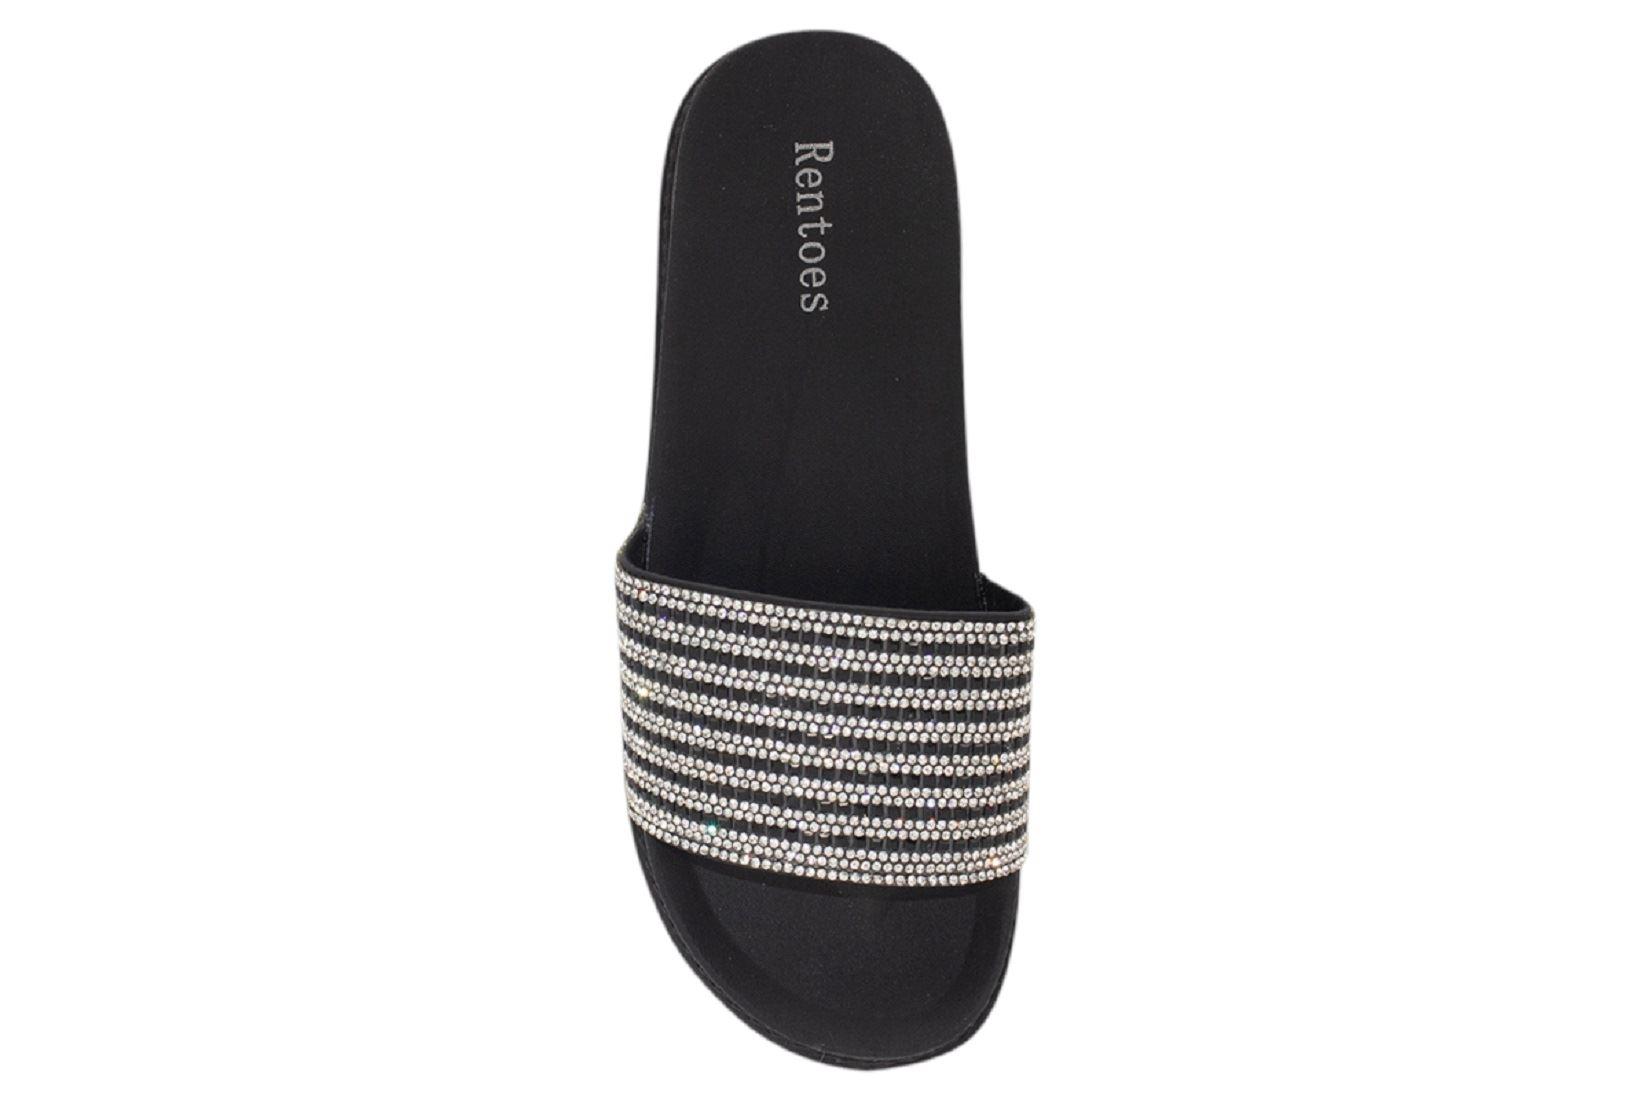 Womens-Sliders-Casual-Slippers-Mules-Ladies-Diamante-Flip-Flop-Sandals-Shoes thumbnail 70